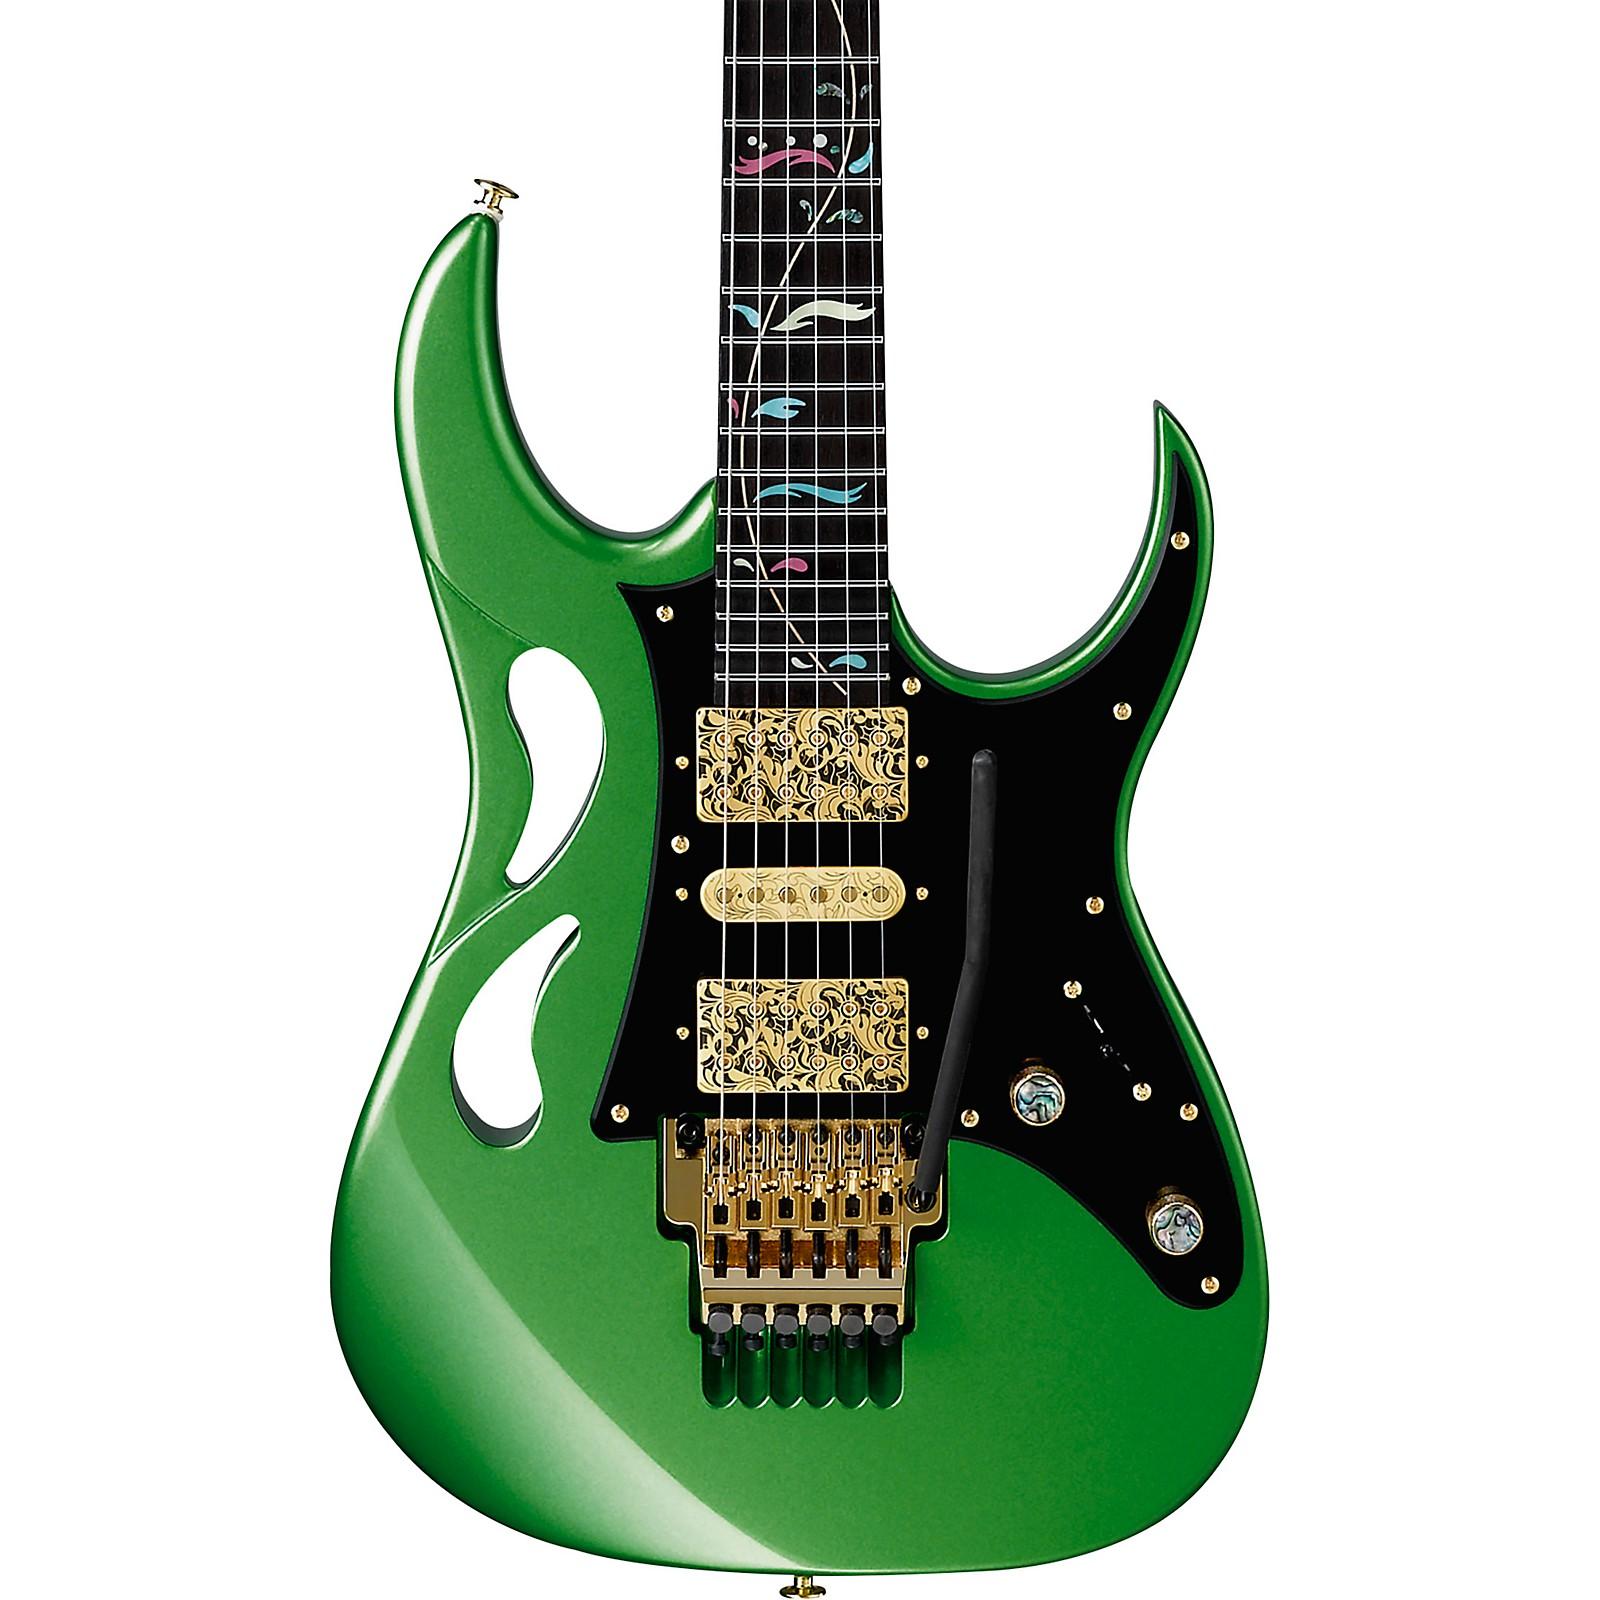 Ibanez PIA3761 Steve Vai Signature Electric Guitar